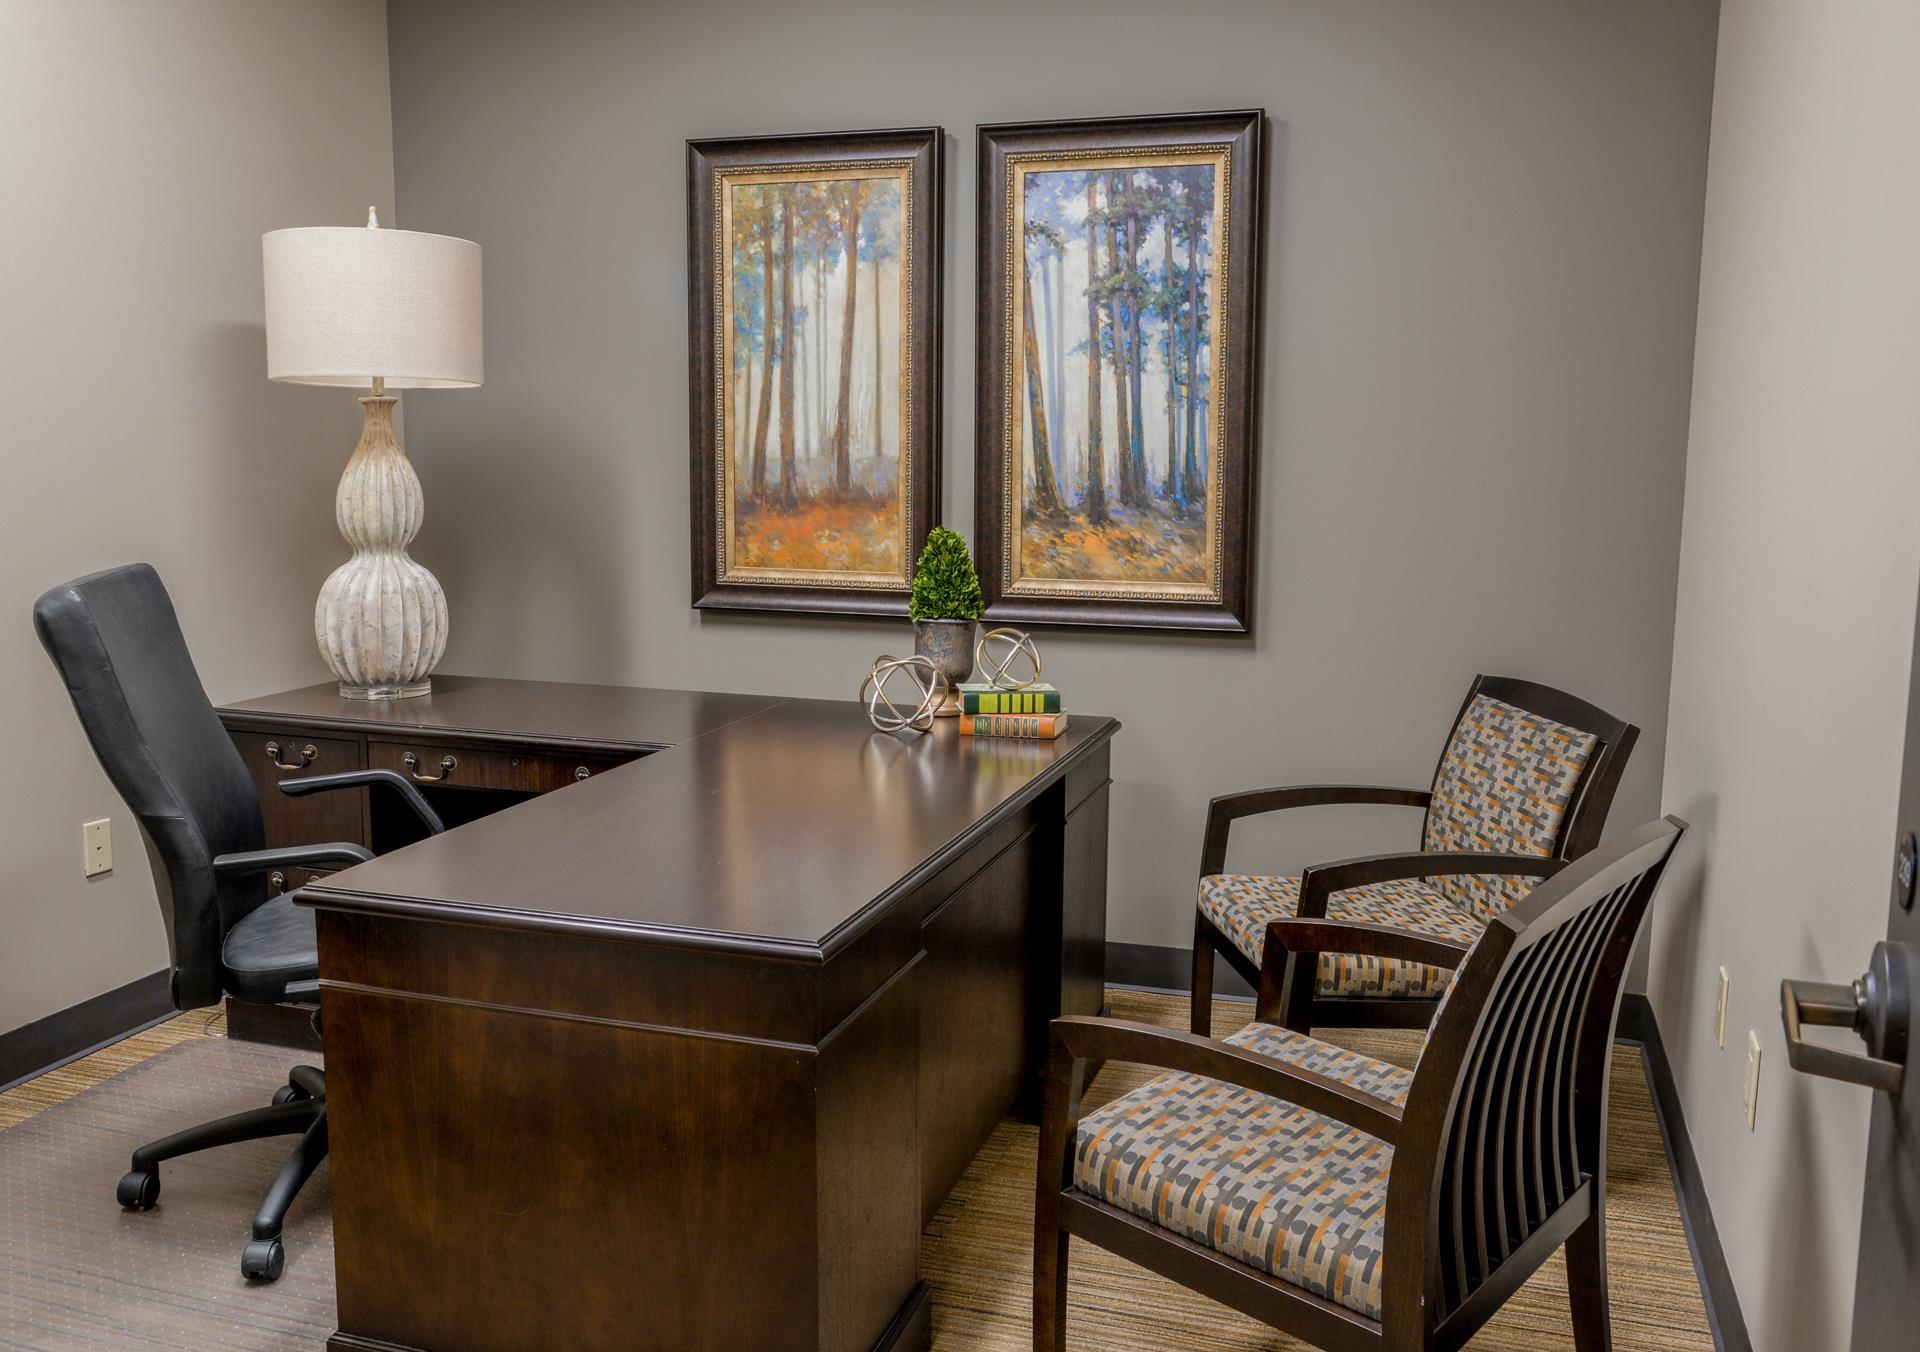 The Woodlands Office Suites - Suite #239 - Small Interior L-Desk